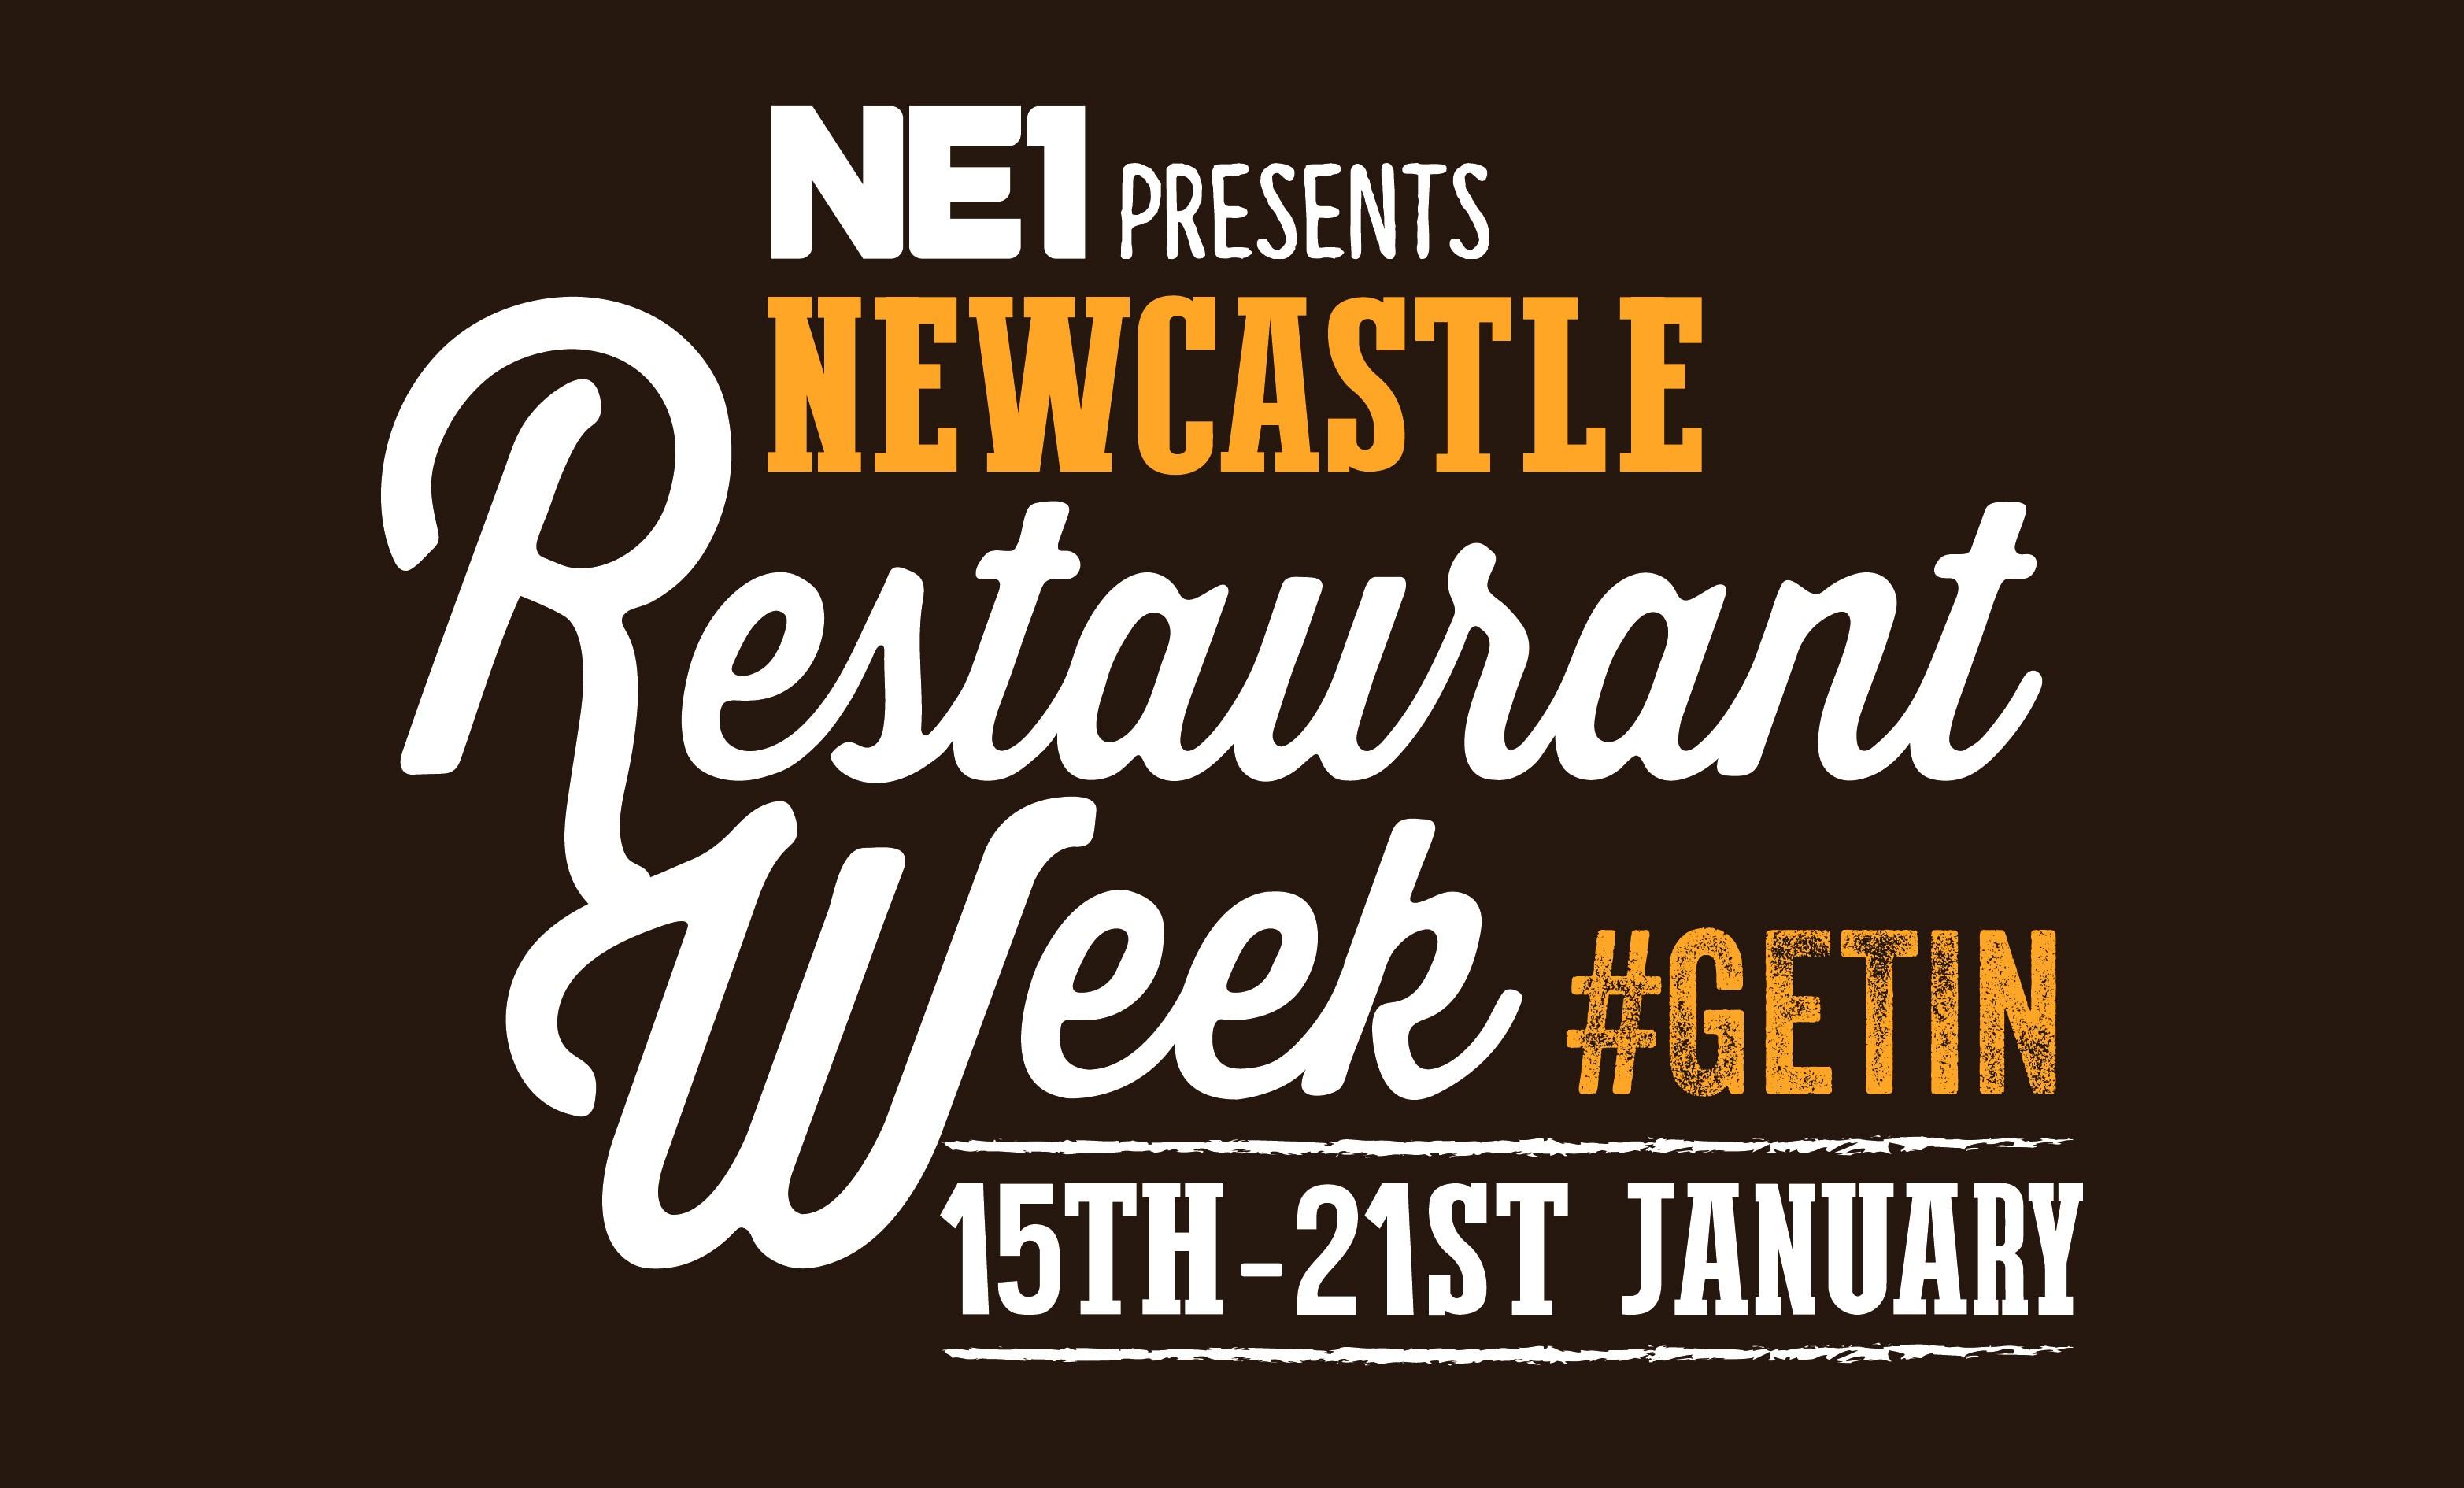 NE1 Restaurant Week - Enjoy fantastic food in Newcastle's finest restaurants for only £10 or £15pp!